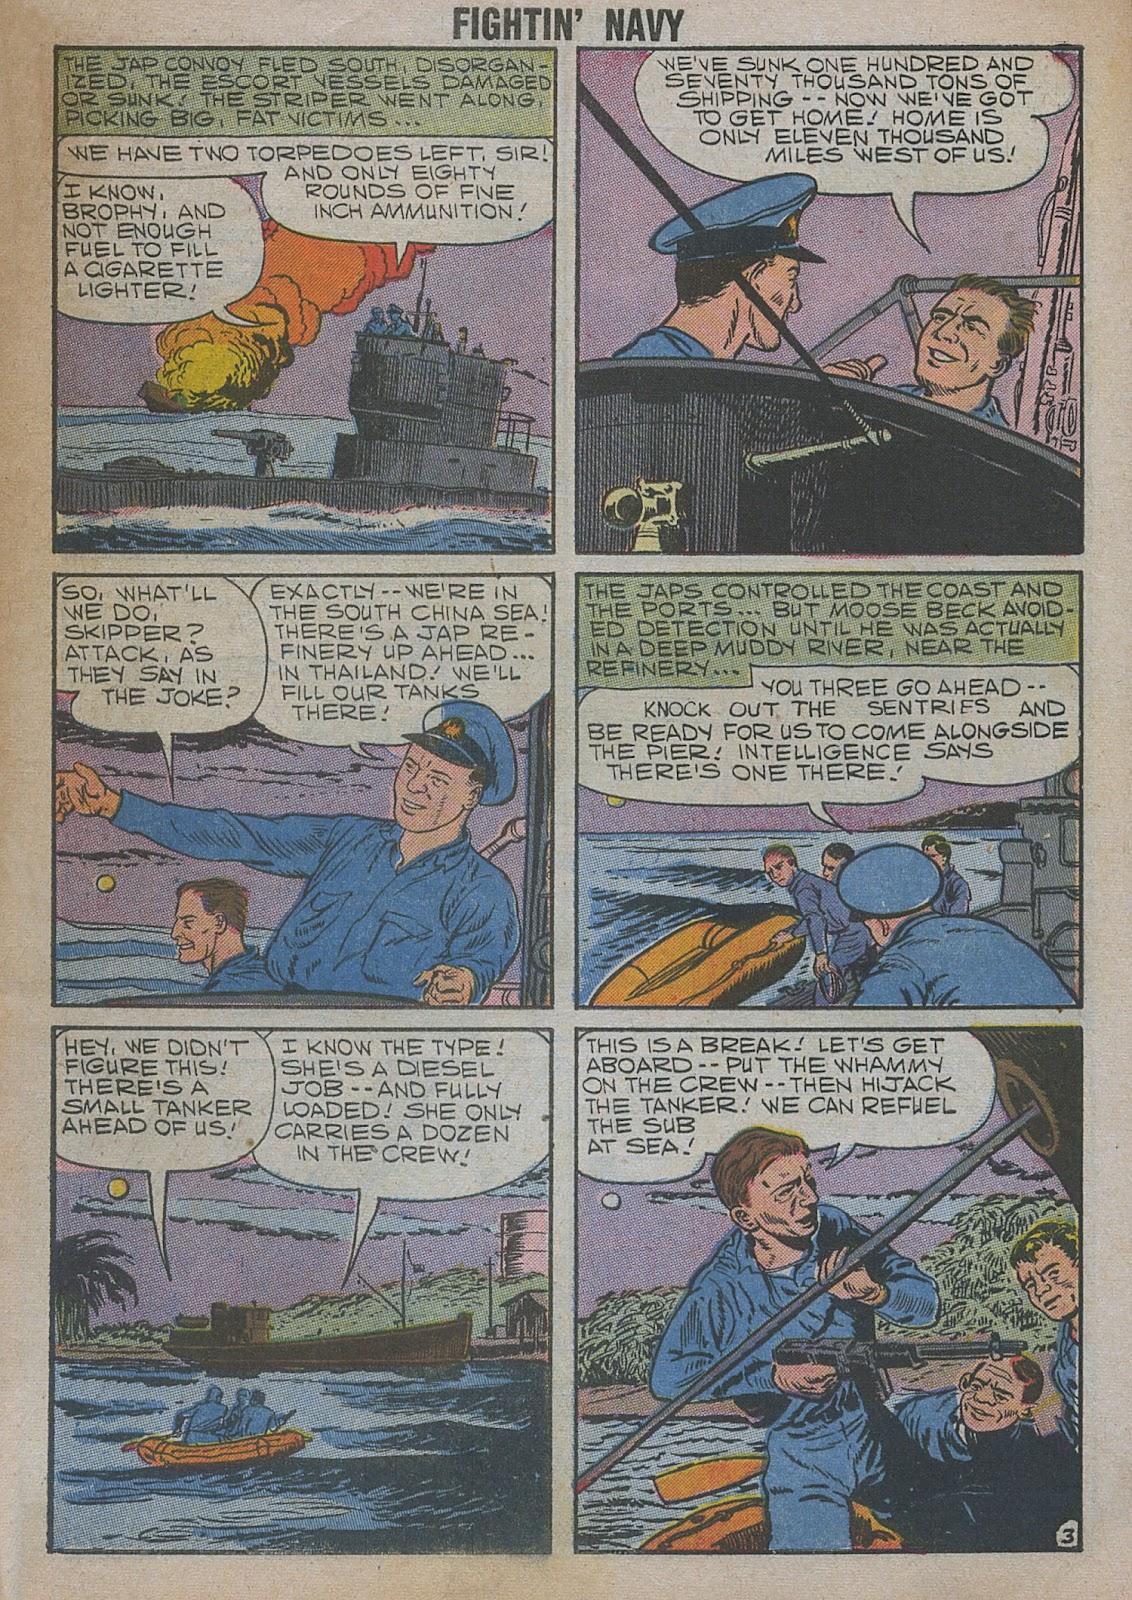 Read online Fightin' Navy comic -  Issue #82 - 5